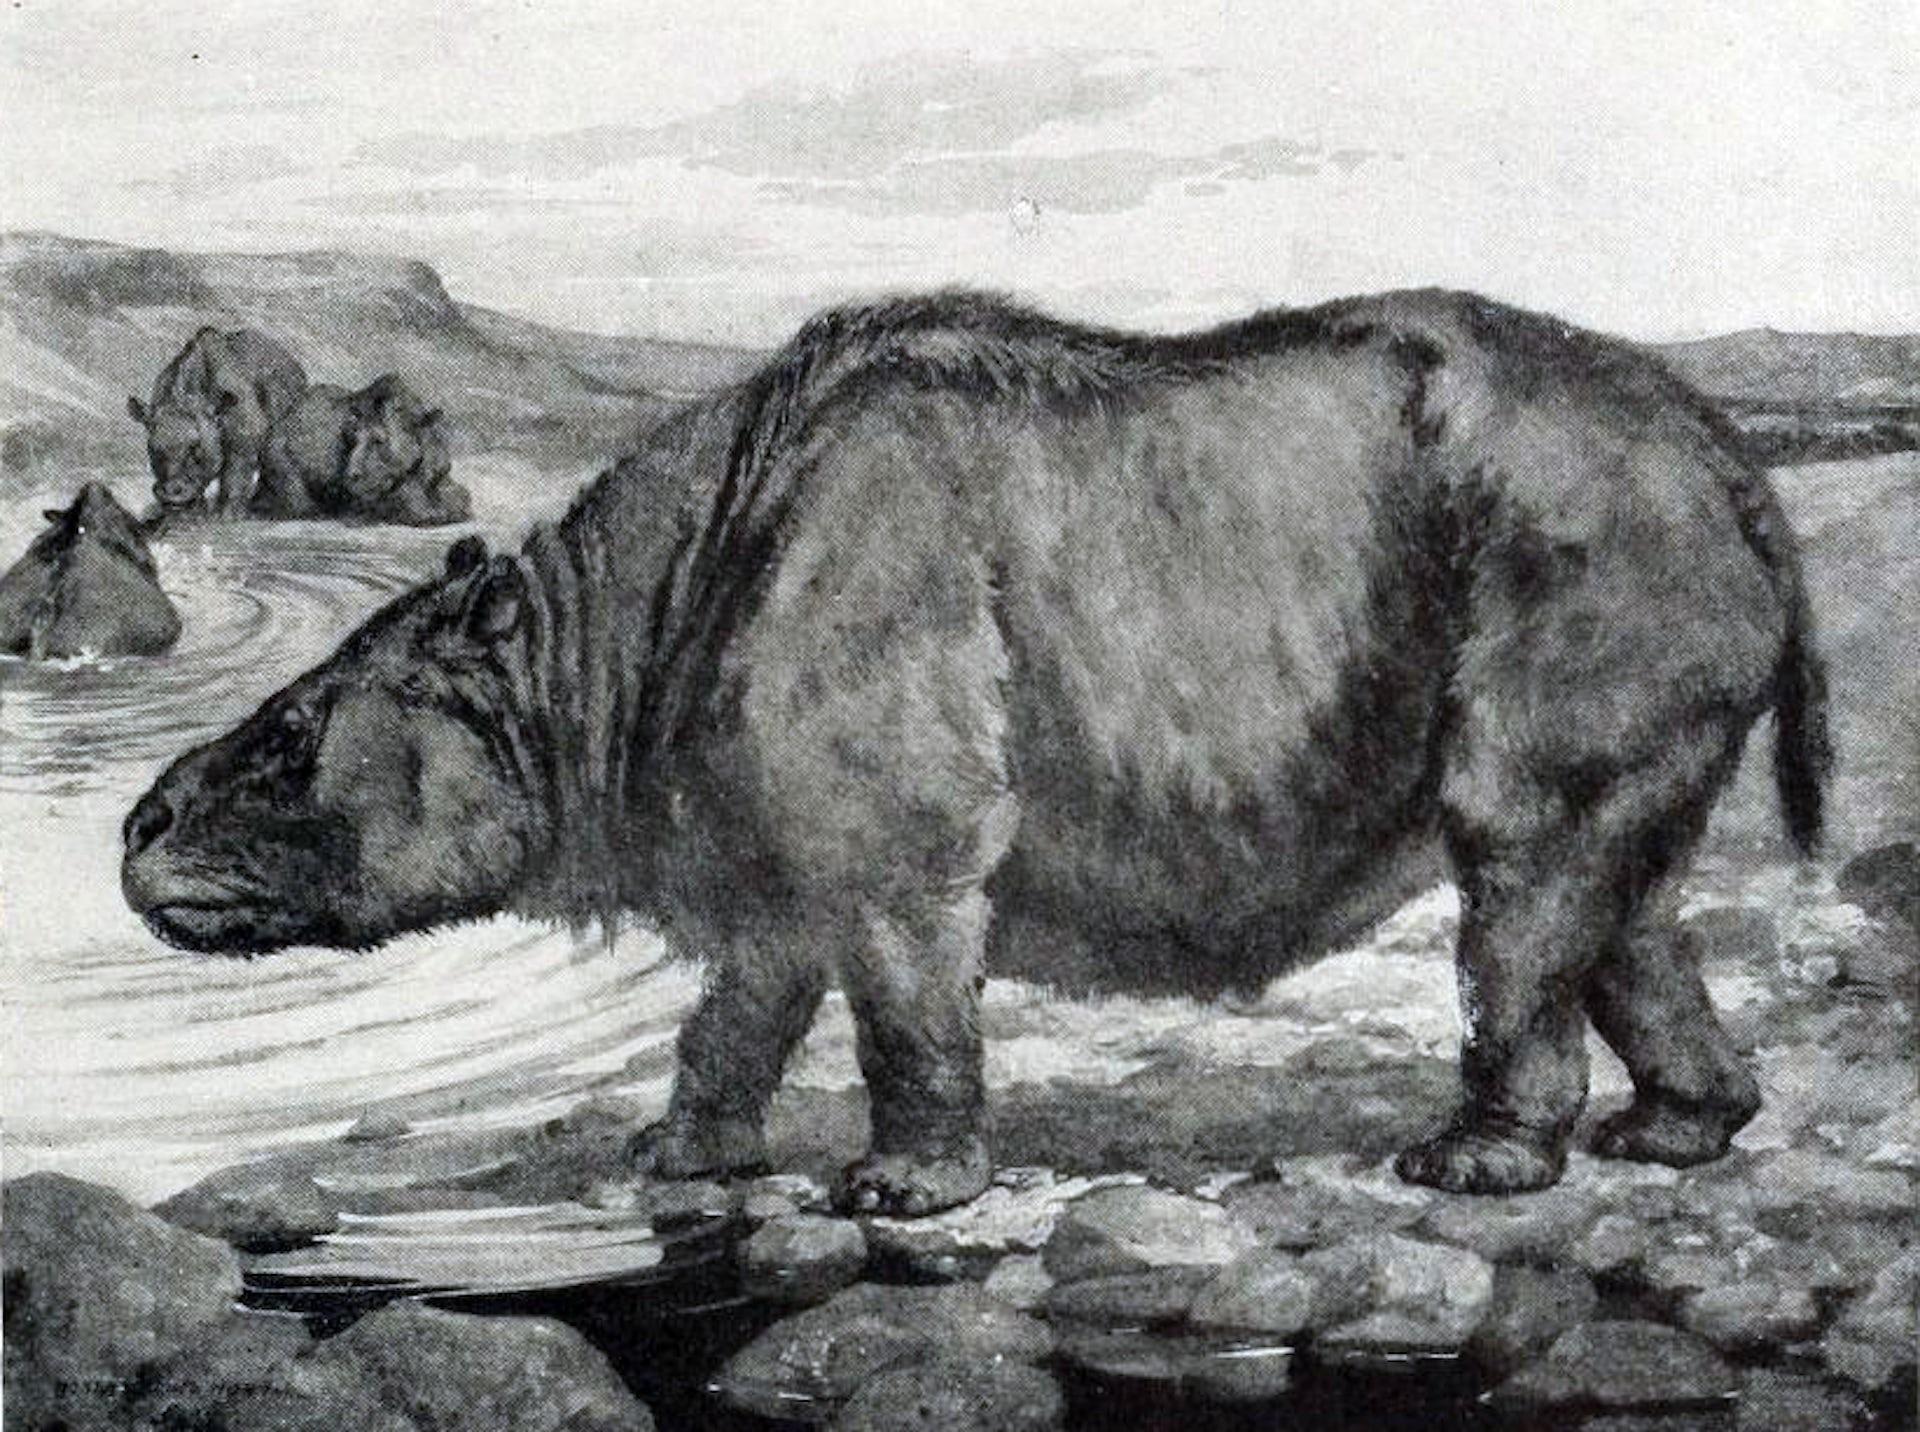 A toxodon - an extinct animal larger than an elephant - grazes.